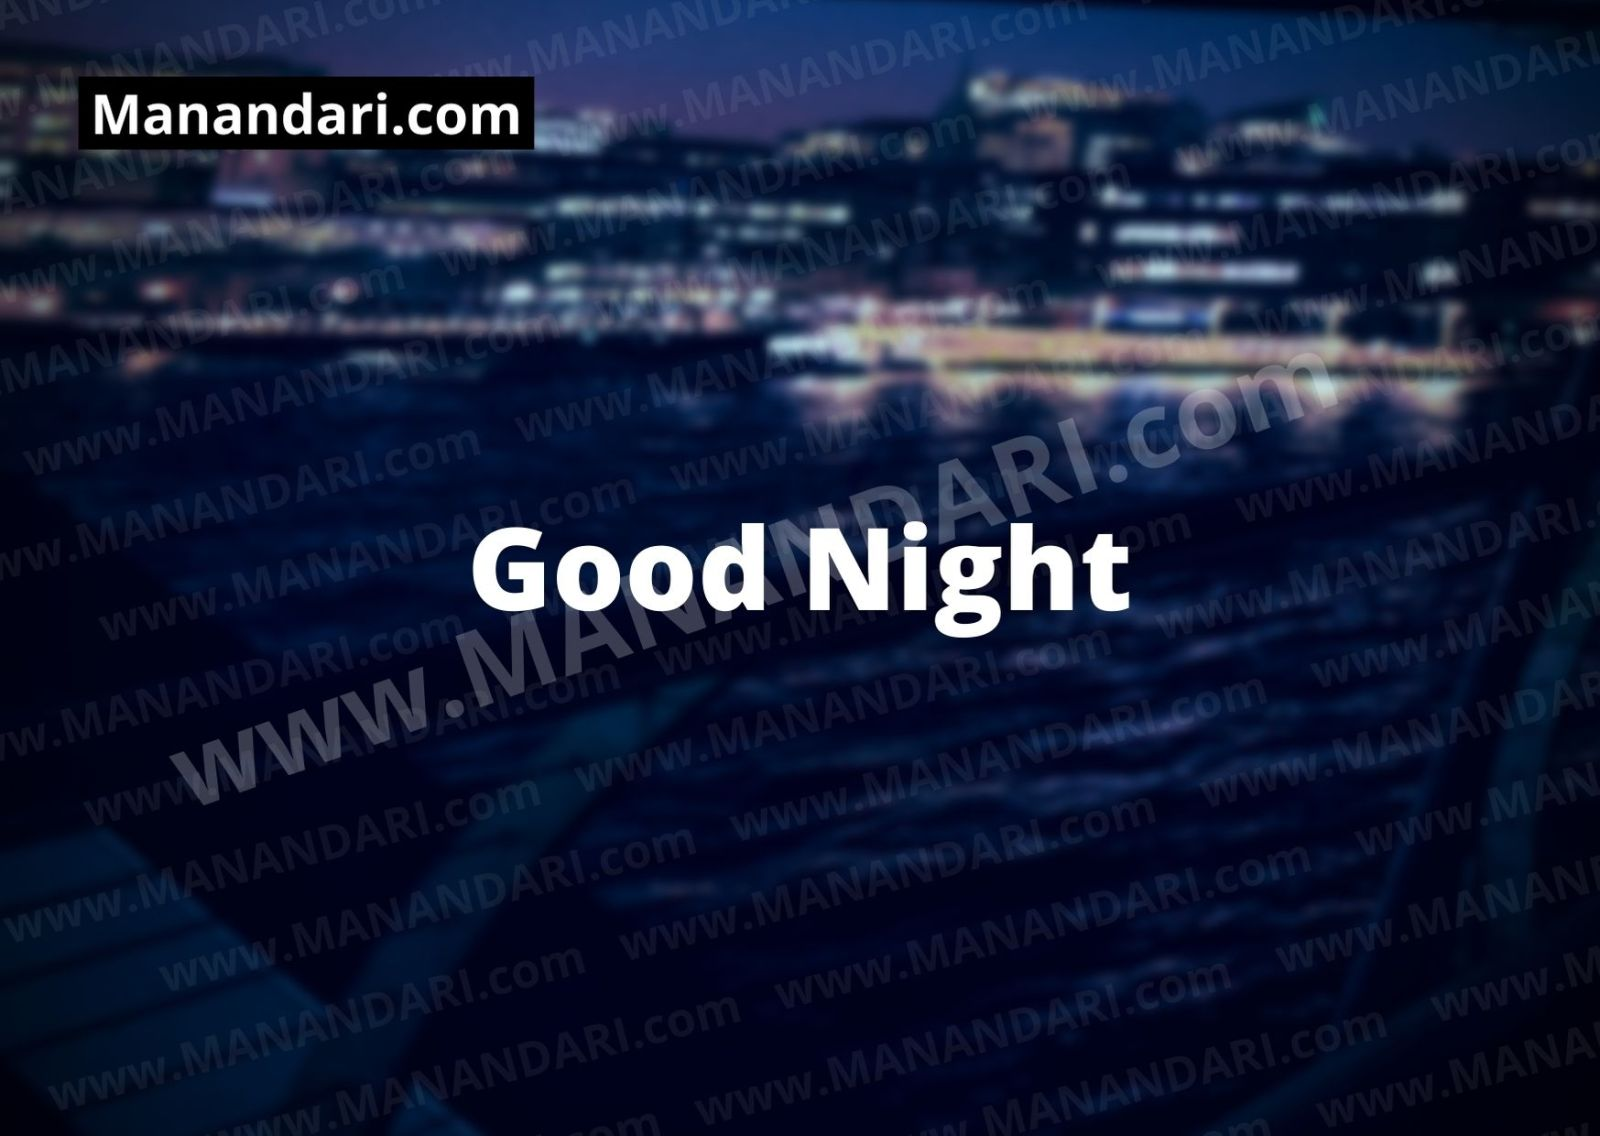 Good Night - 9